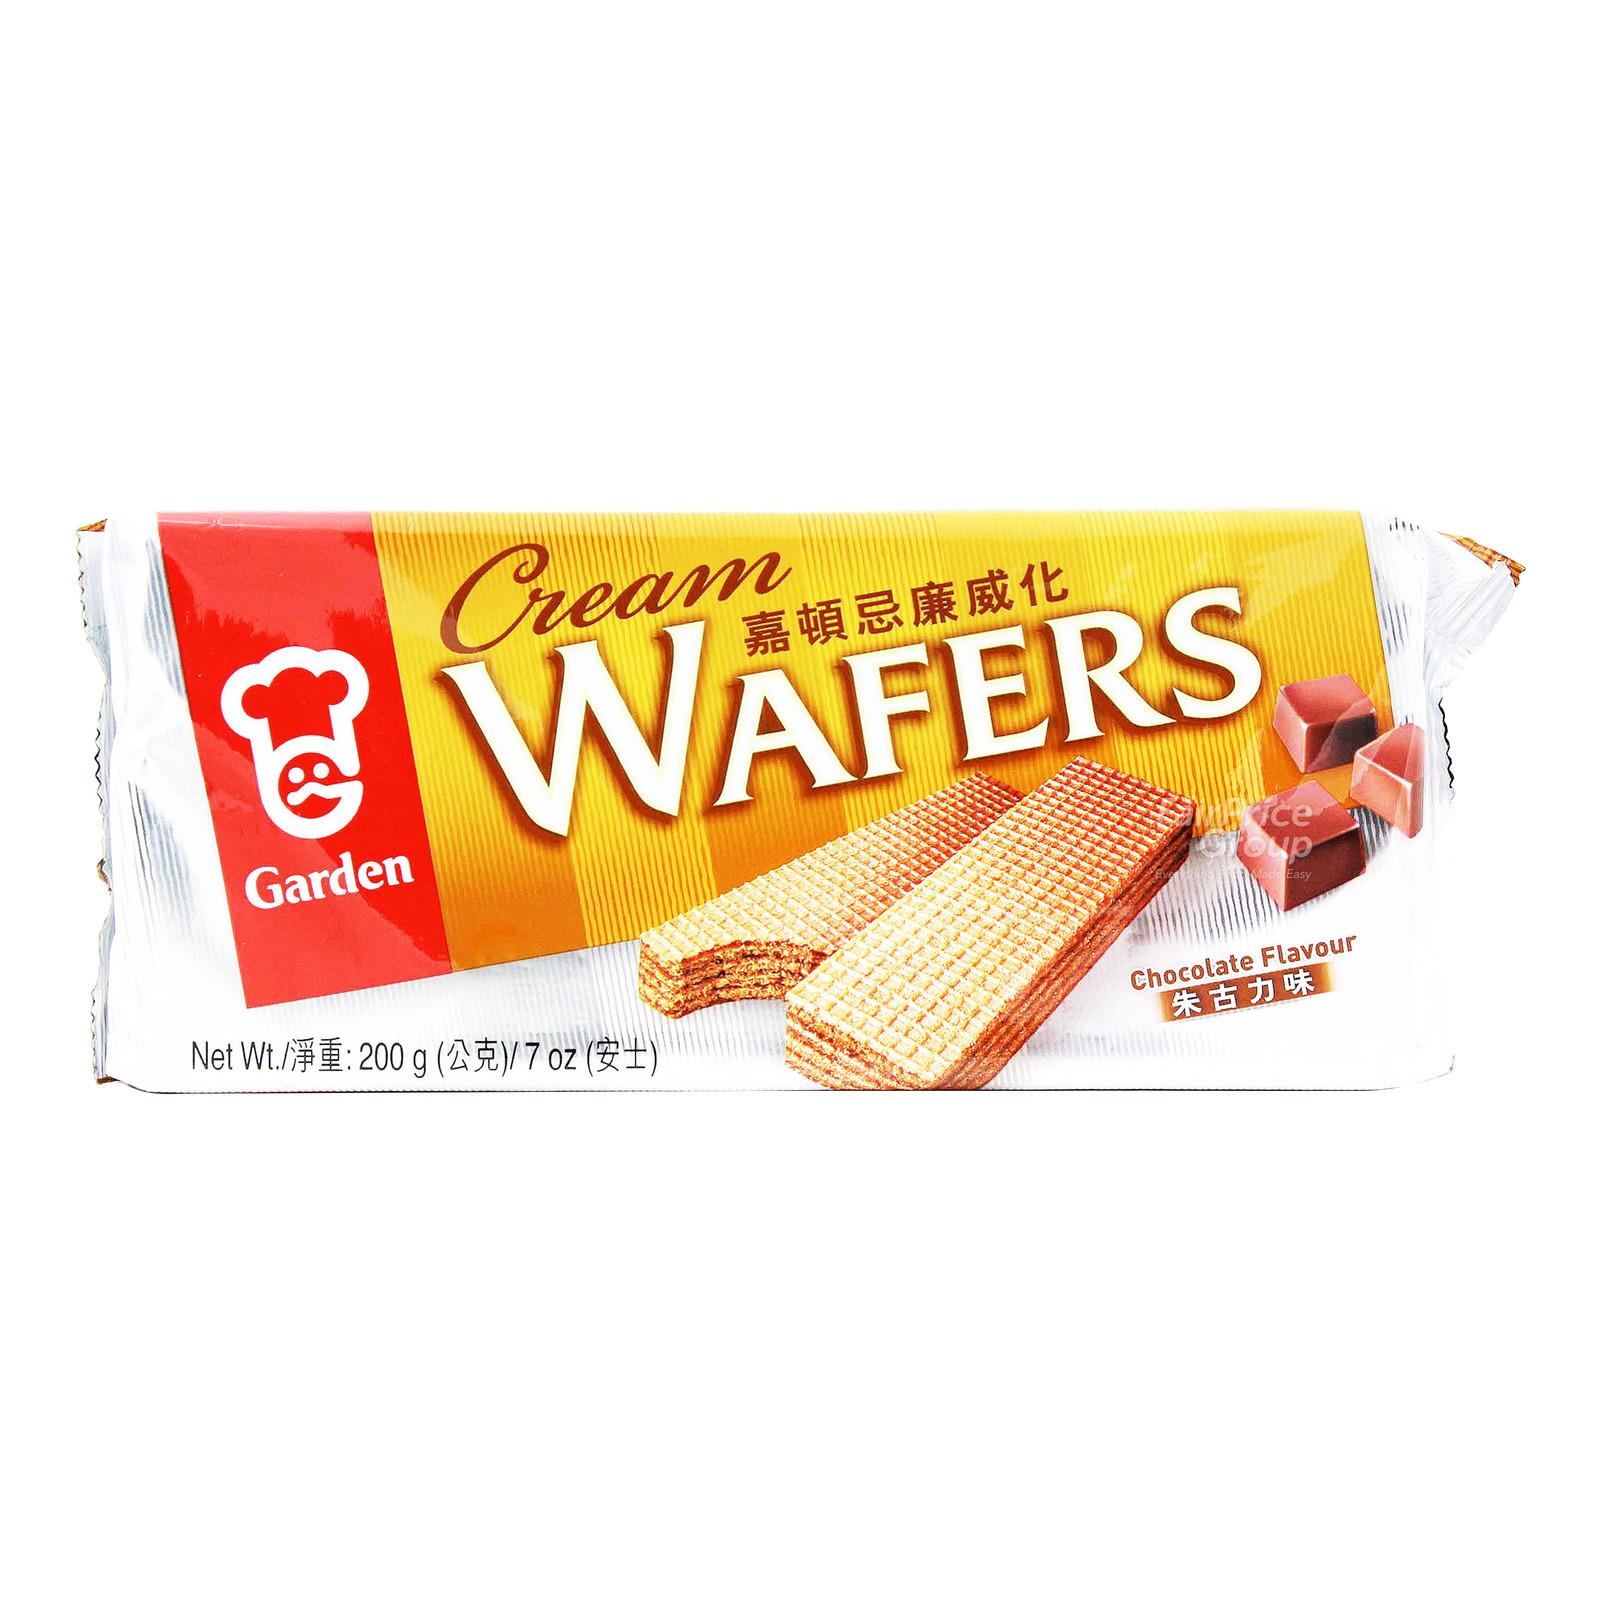 Garden Cream Wafers - Chocolate